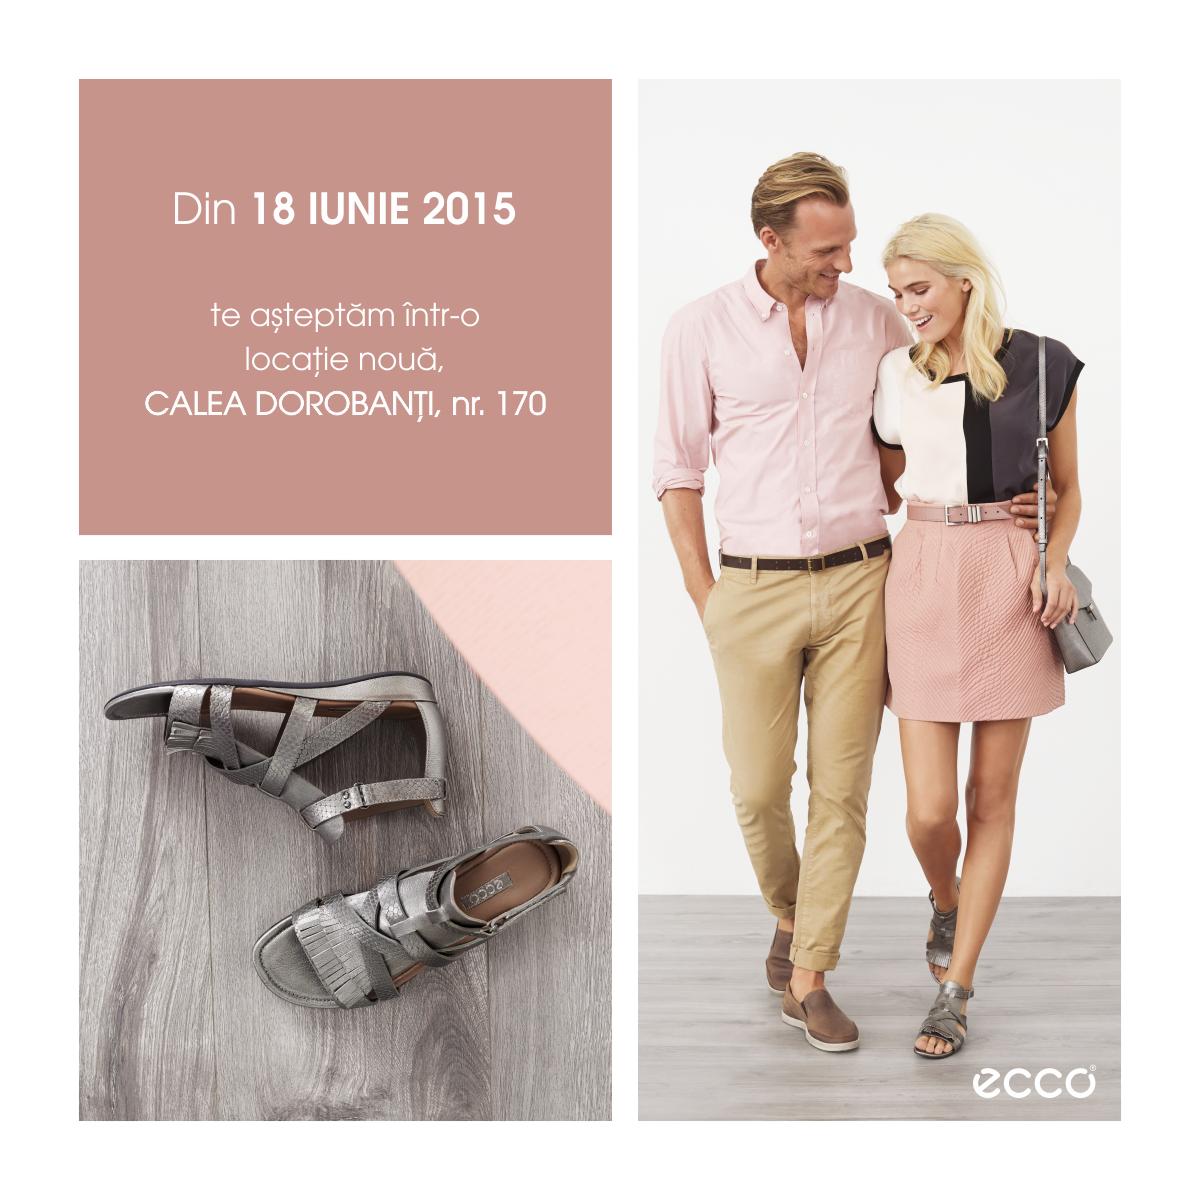 ECCO Shoes deschide pe 18 Iunie un nou magazin in Dorobanti si ofera un discount cu avioane de hartie